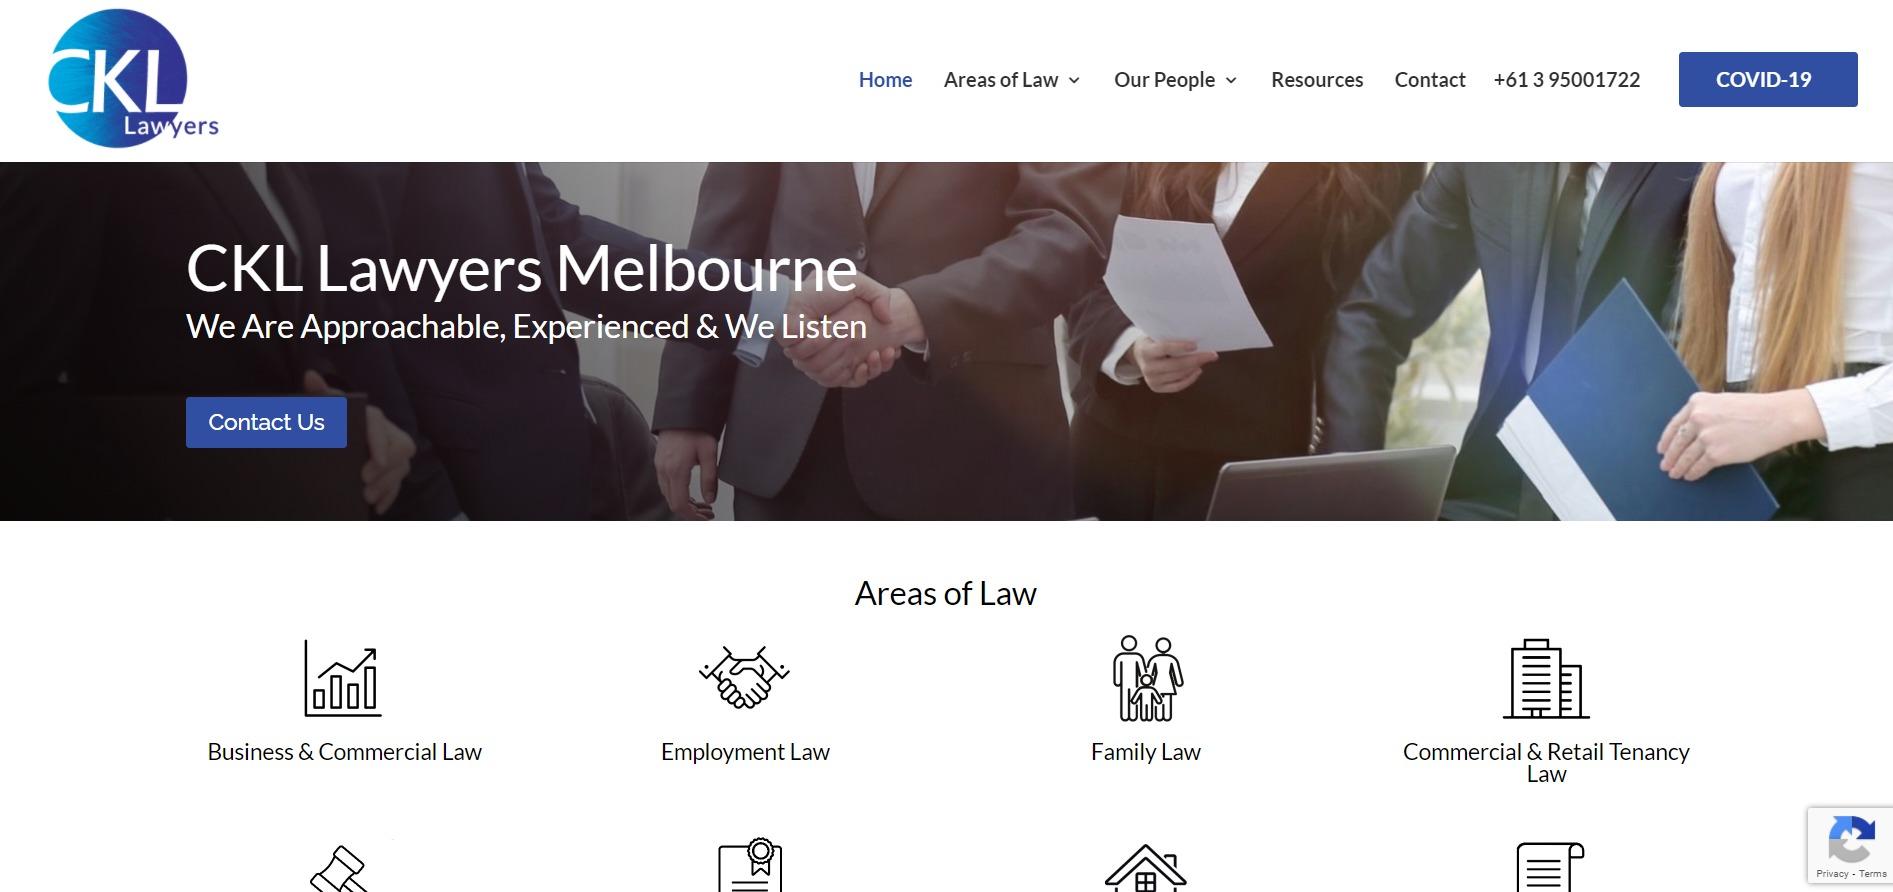 Ckl Lawyers Melbourne